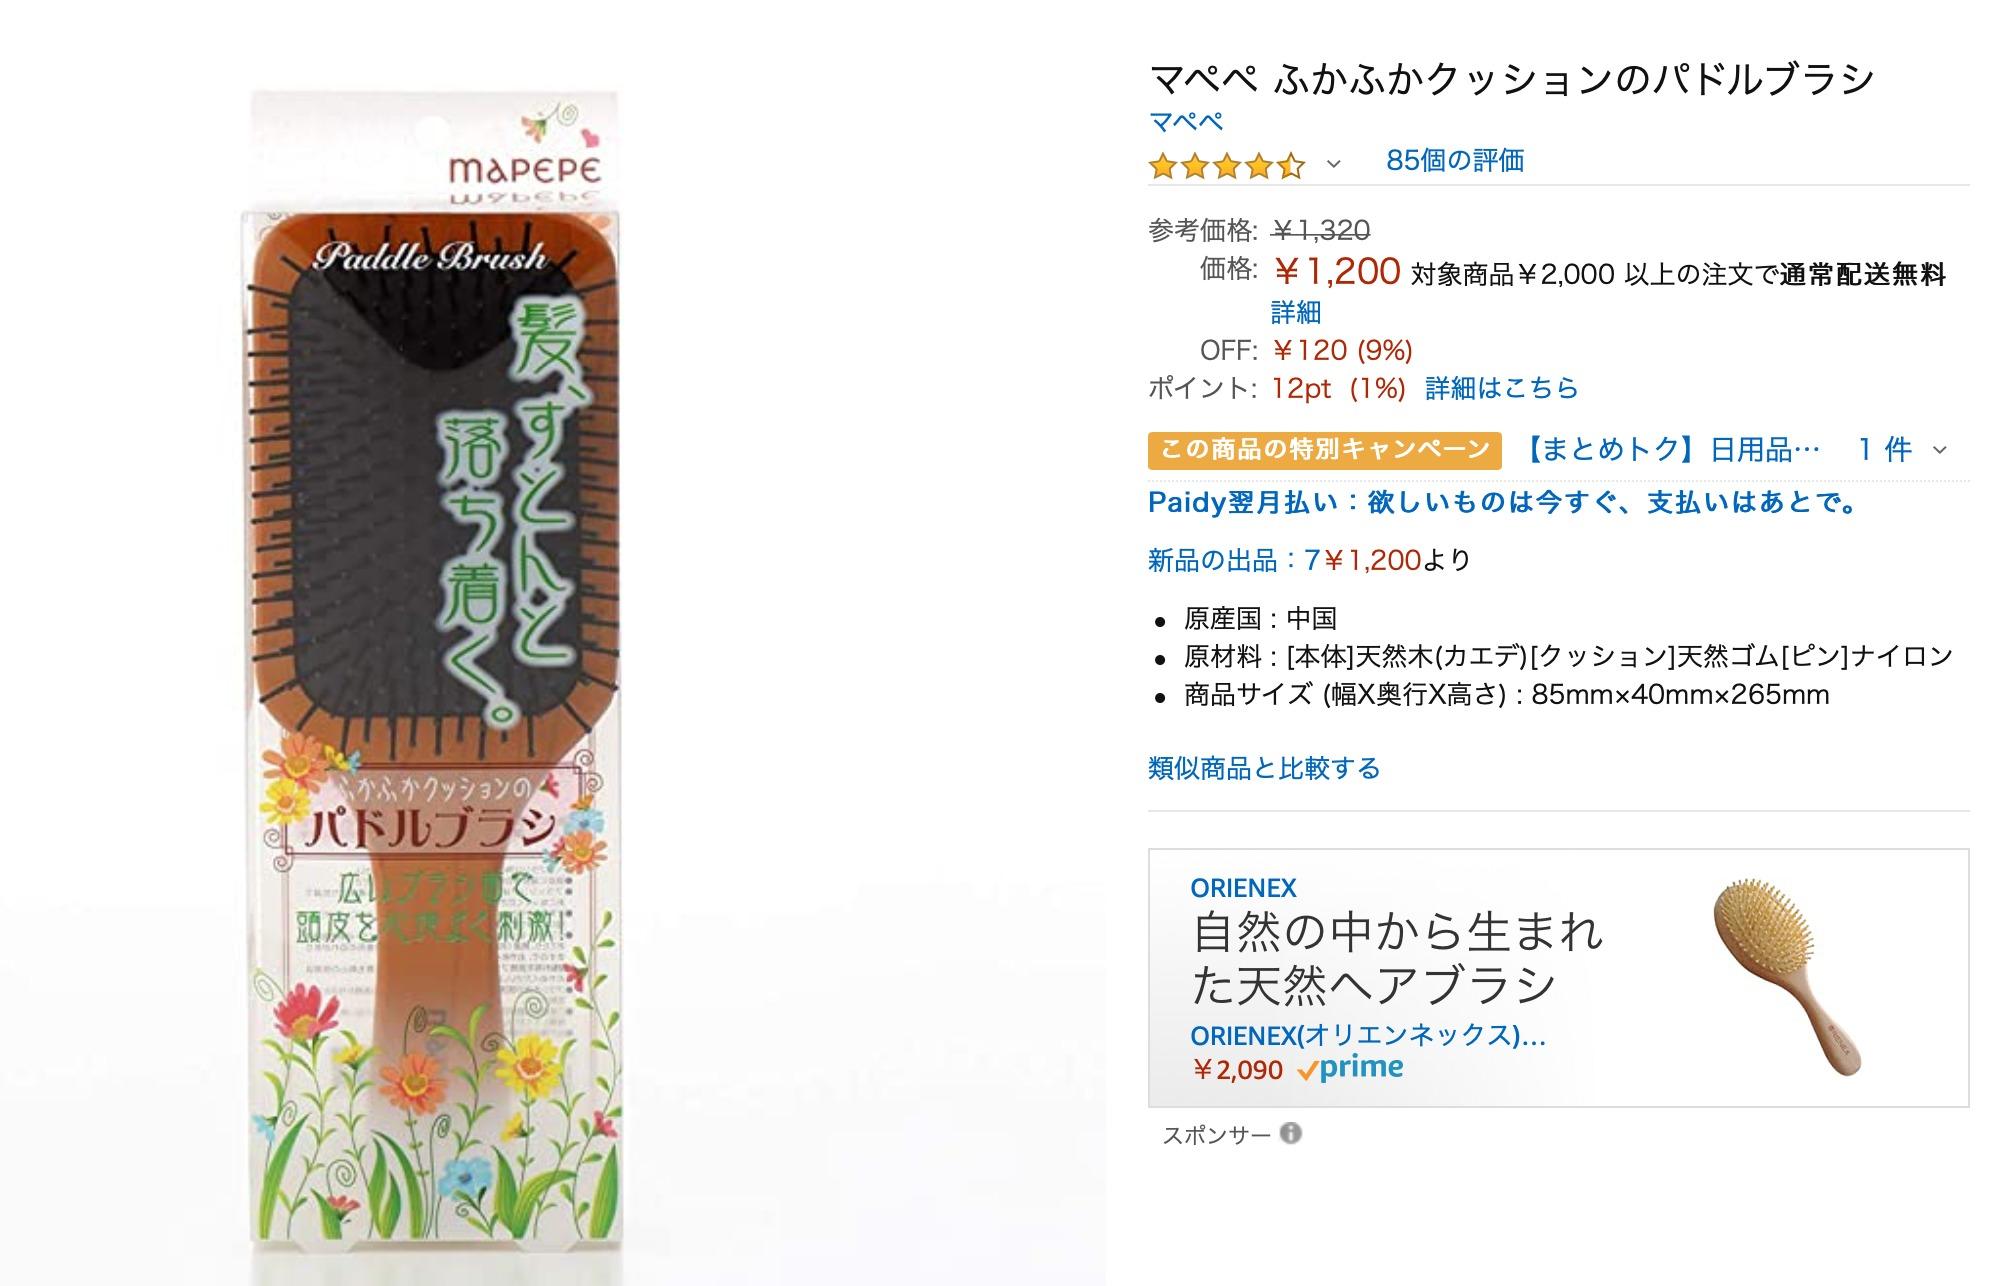 MAPEPE Amazon購入画面